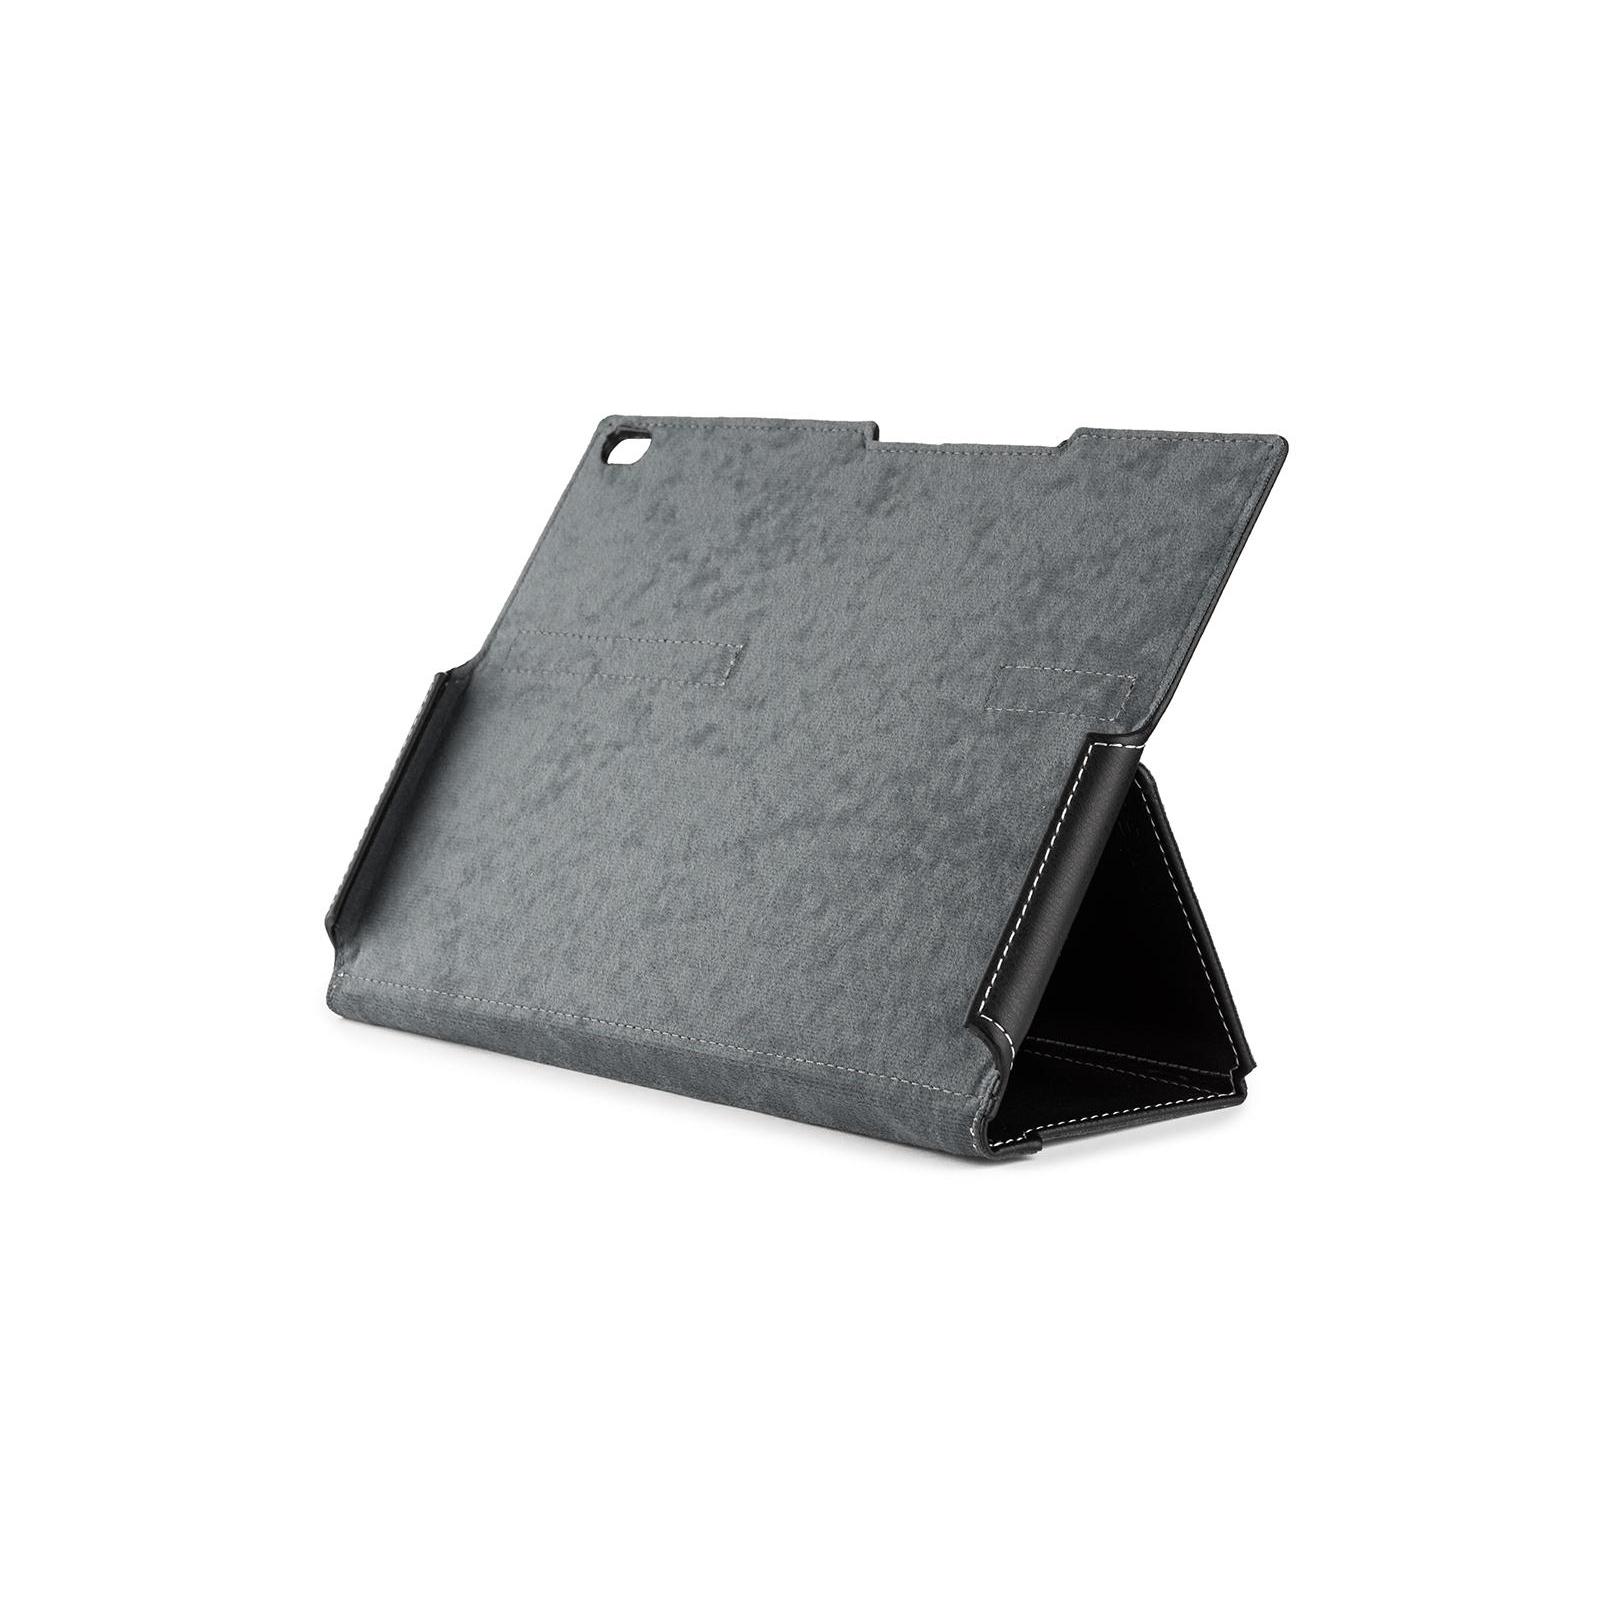 Чехол для планшета Lenovo Tab 4 10 LTE black Vinga (VNTB10LTE) изображение 4